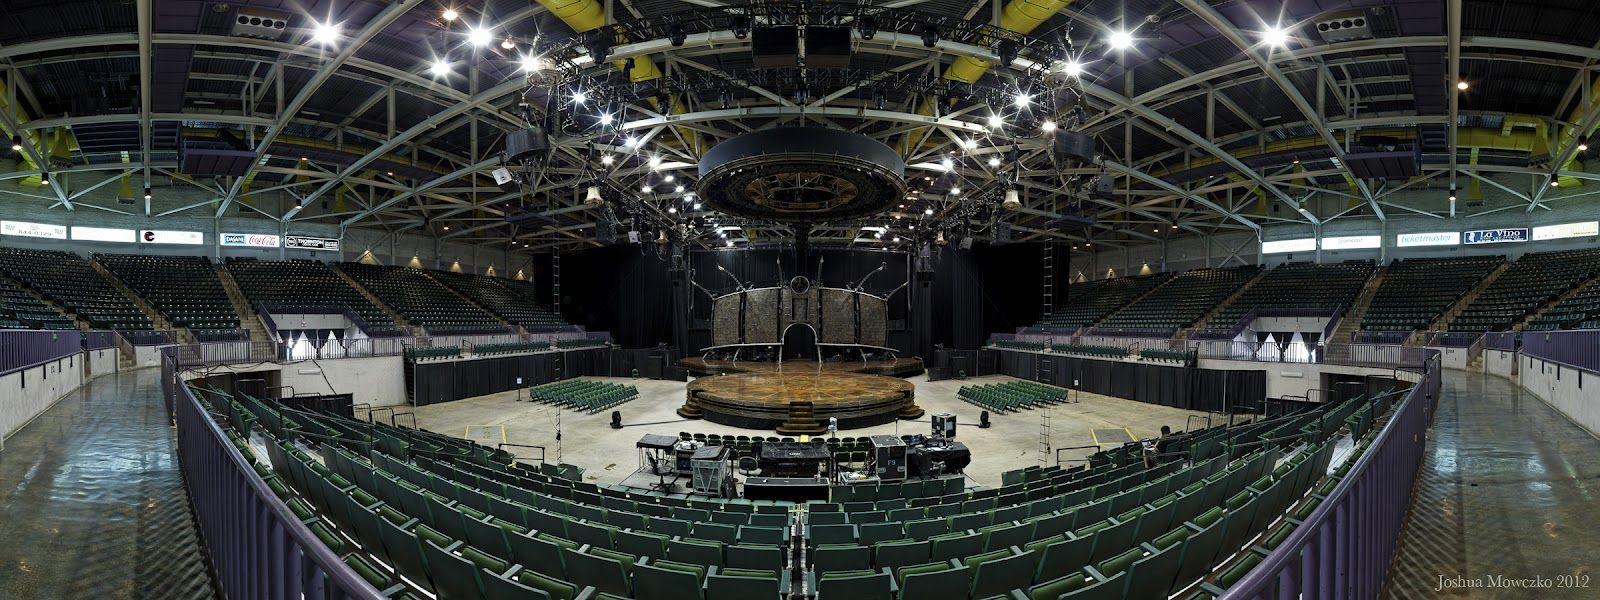 Bancorpsouth Arena Seating Charts Arena Seating